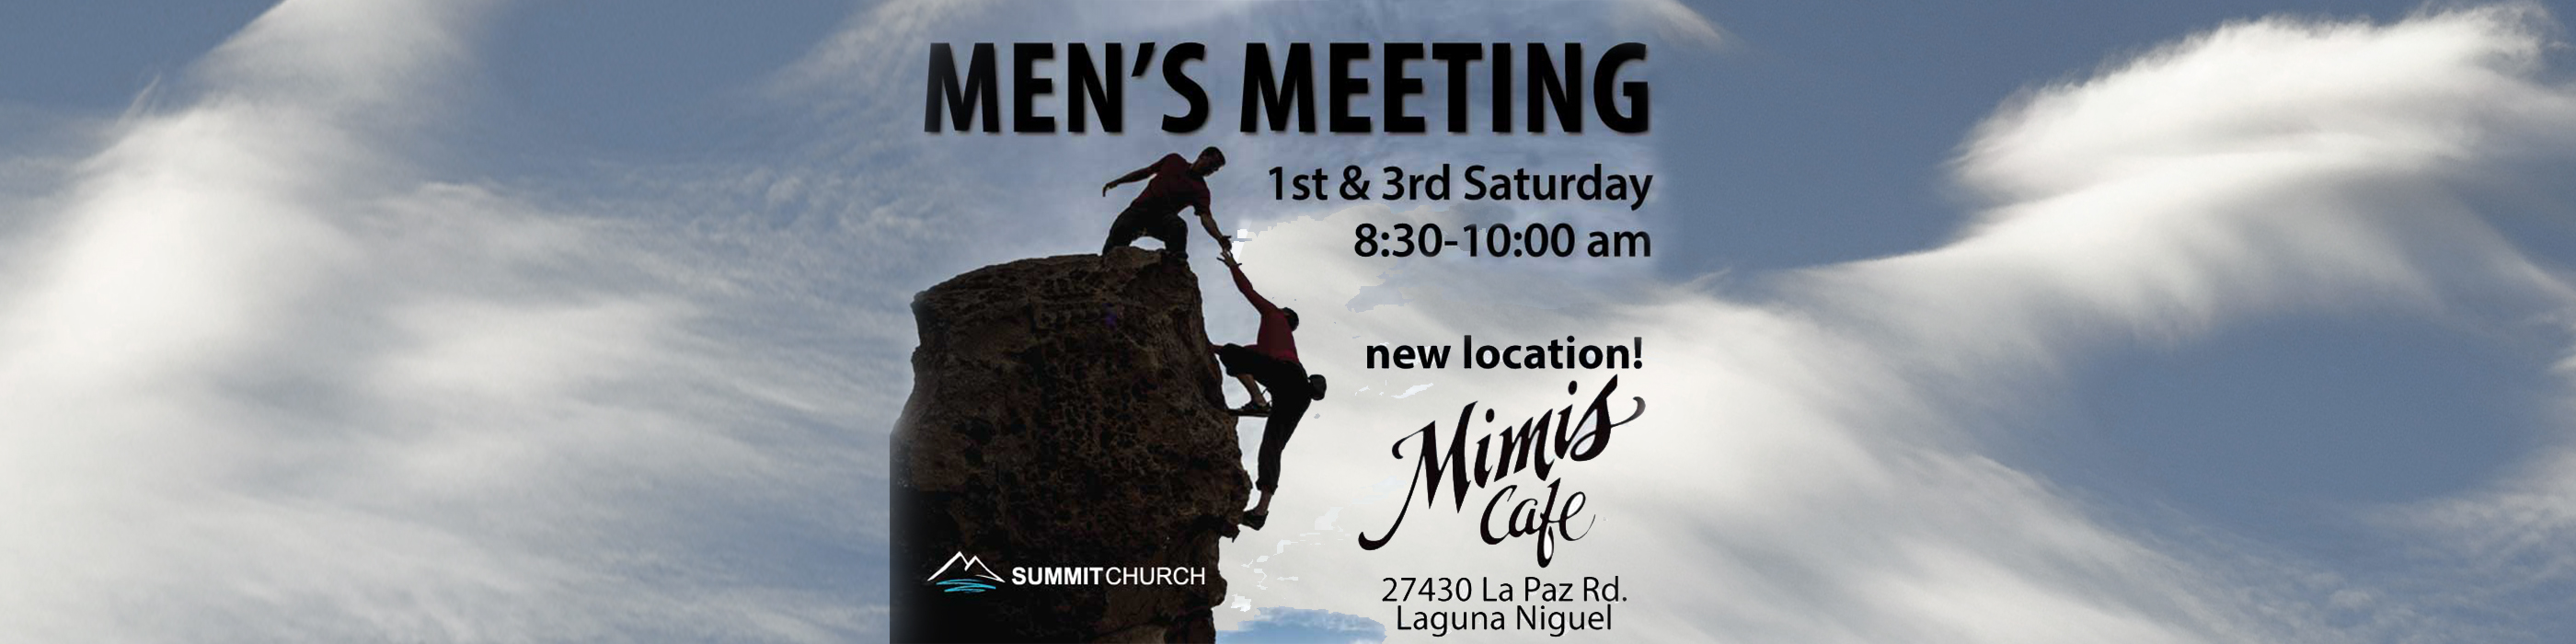 mens-meeting-website-2800x700-1